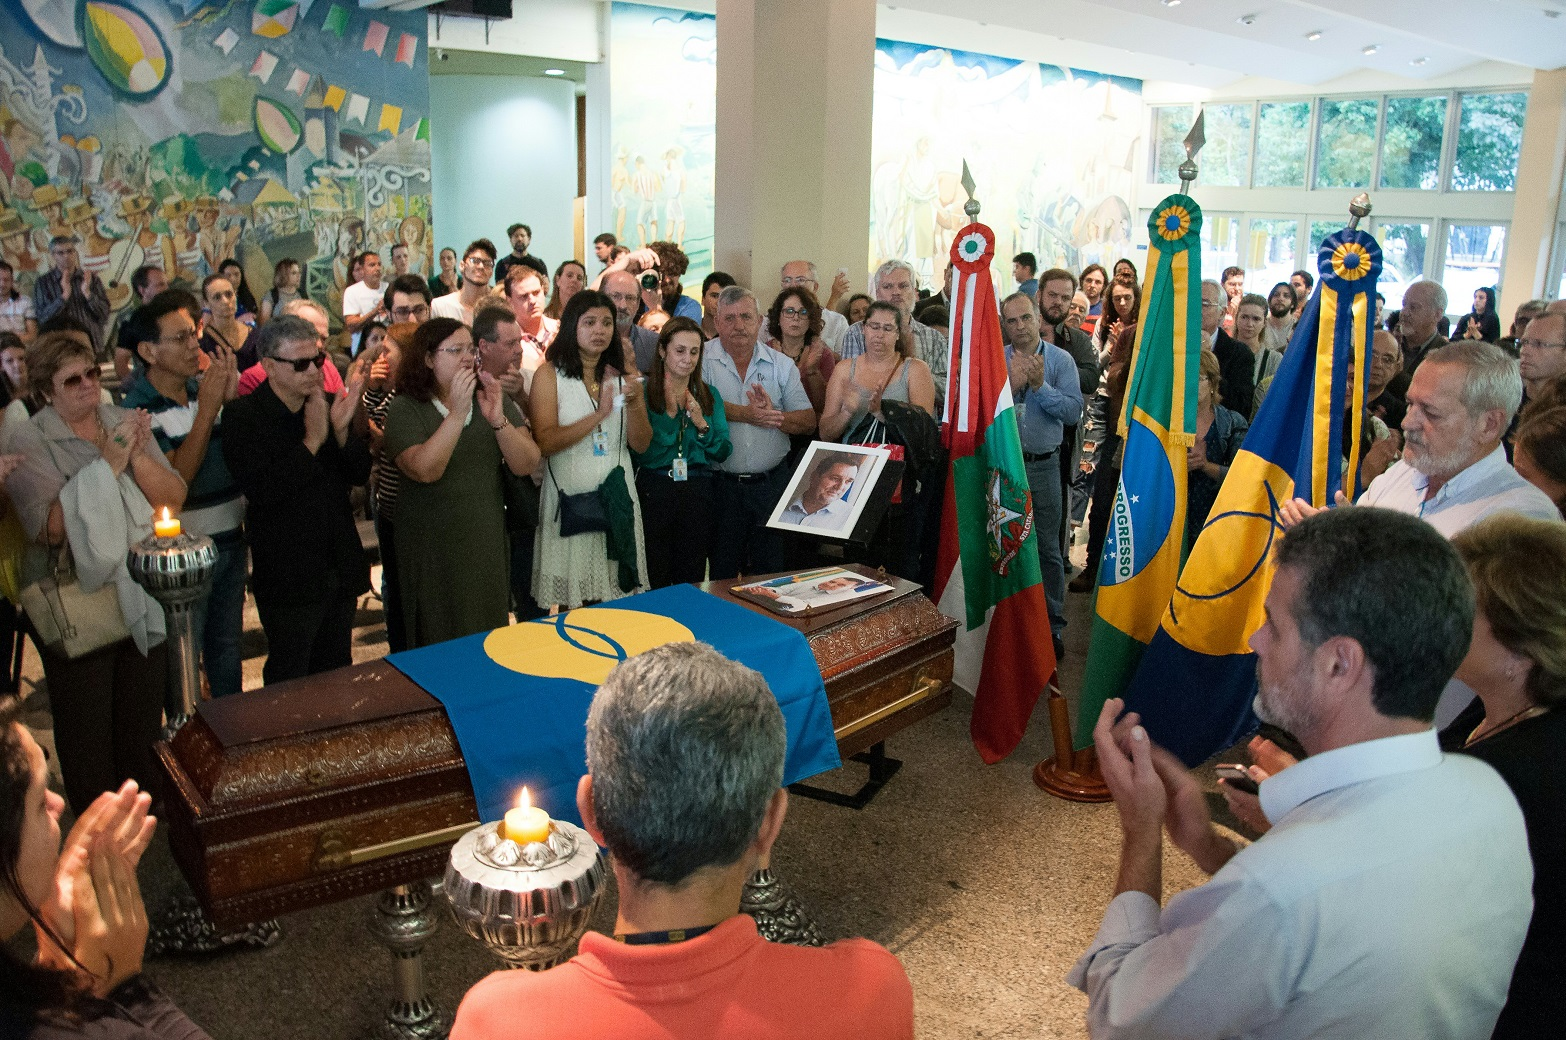 Alunos, amigos e parentes no velório do reitor da Universidade Federal de Santa Catarina (UFSC), Luiz Carlos Cancellier. Foto UFSC